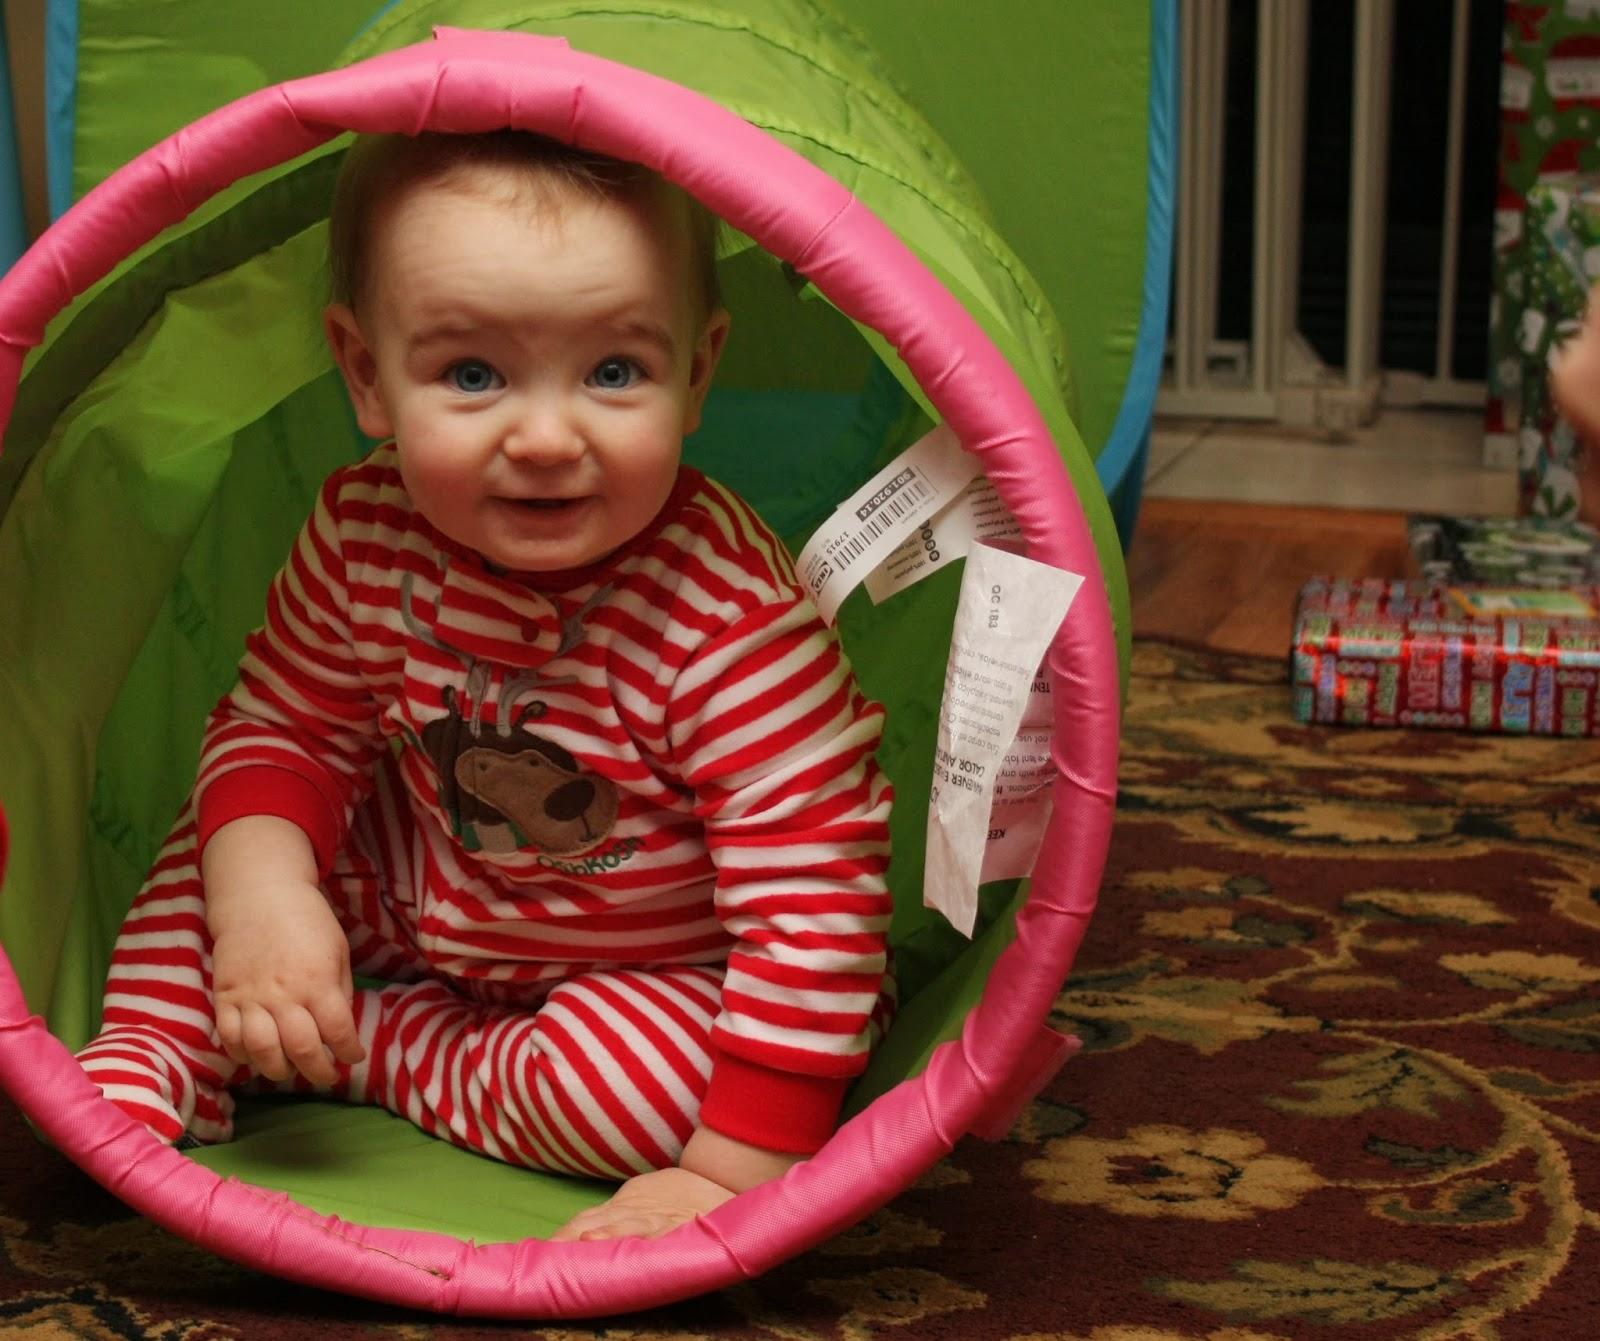 Prize winning baby